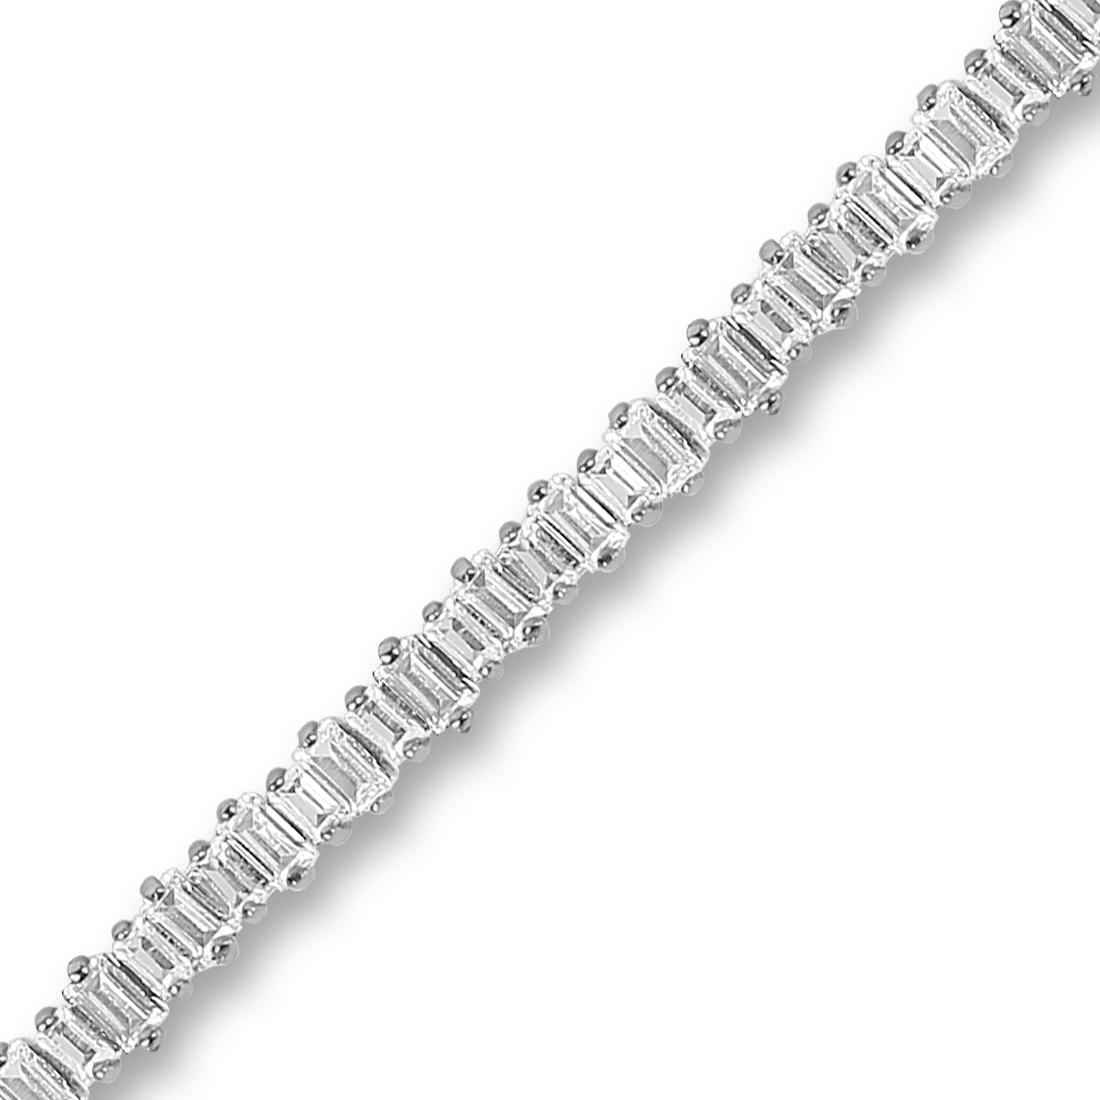 Roadie Silver Bracelet - High Street Jewelry